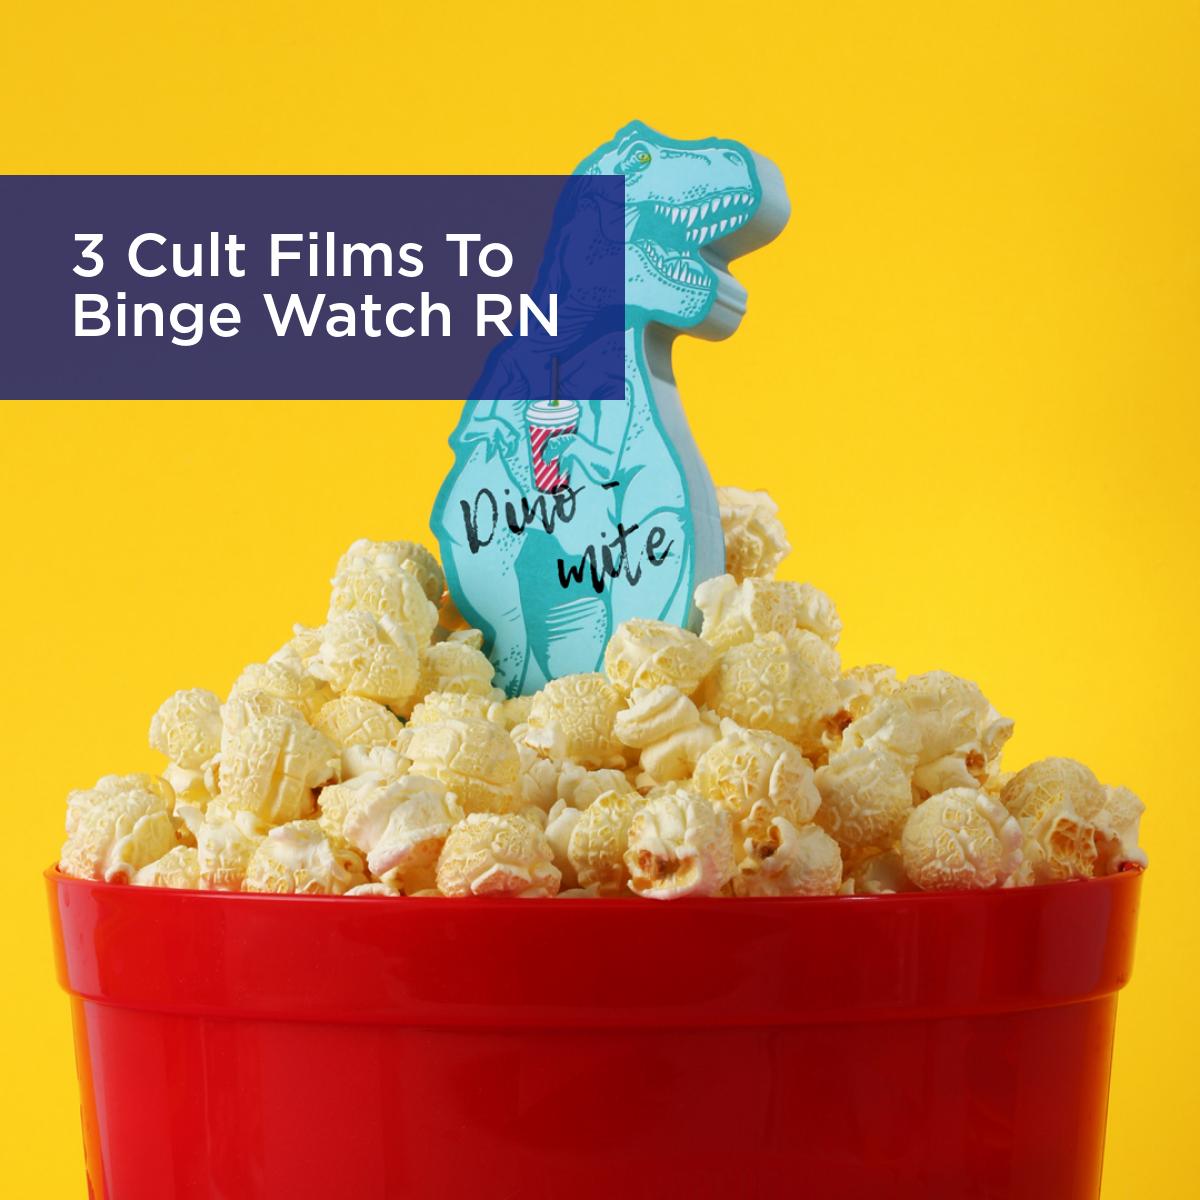 3 Cult Films To Binge Watch RN